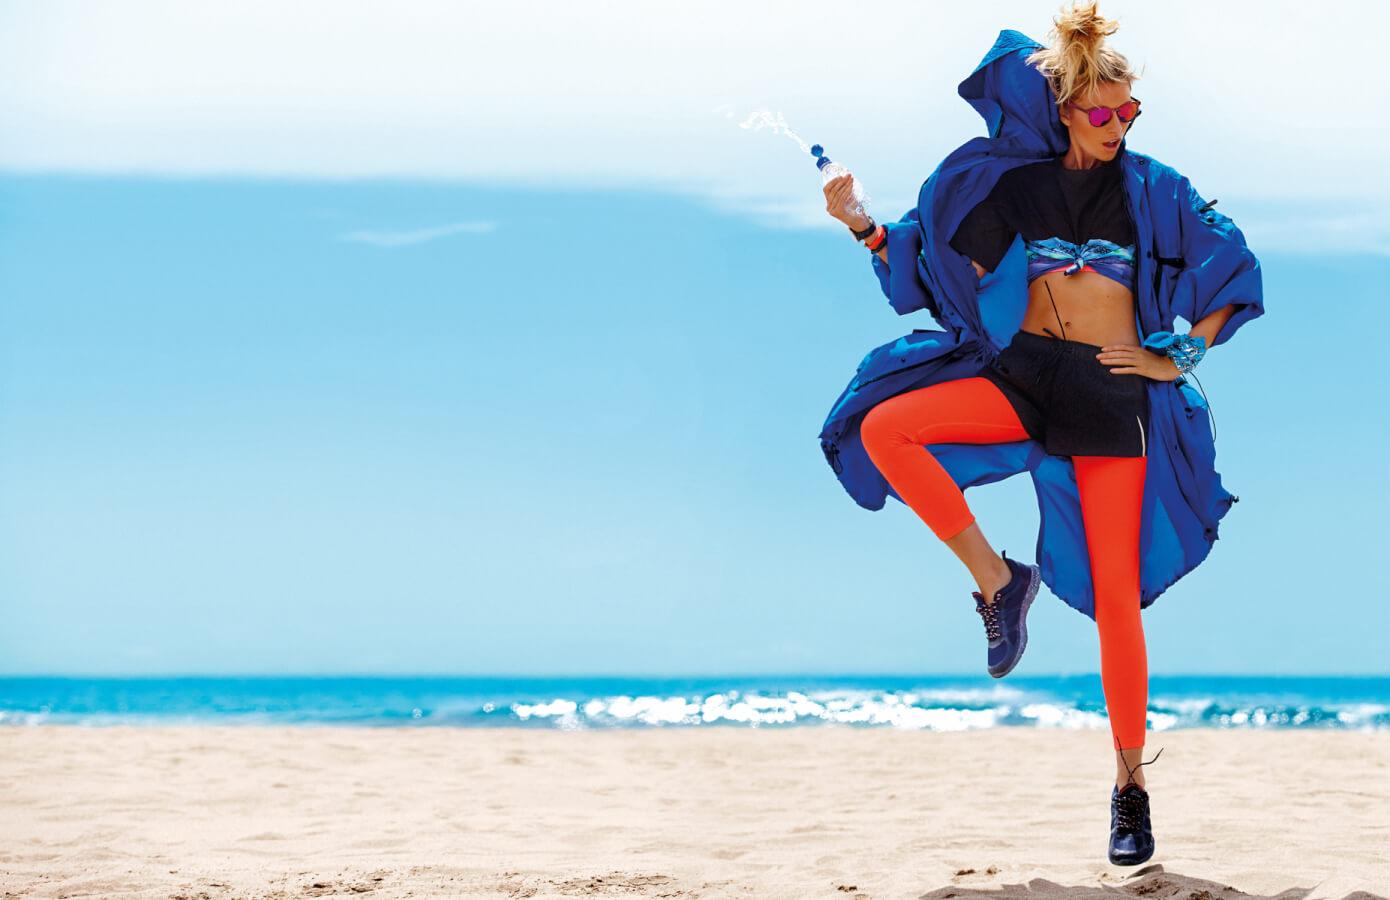 06_Alvaro_Beamud_Cortes_Vogue_Fitness